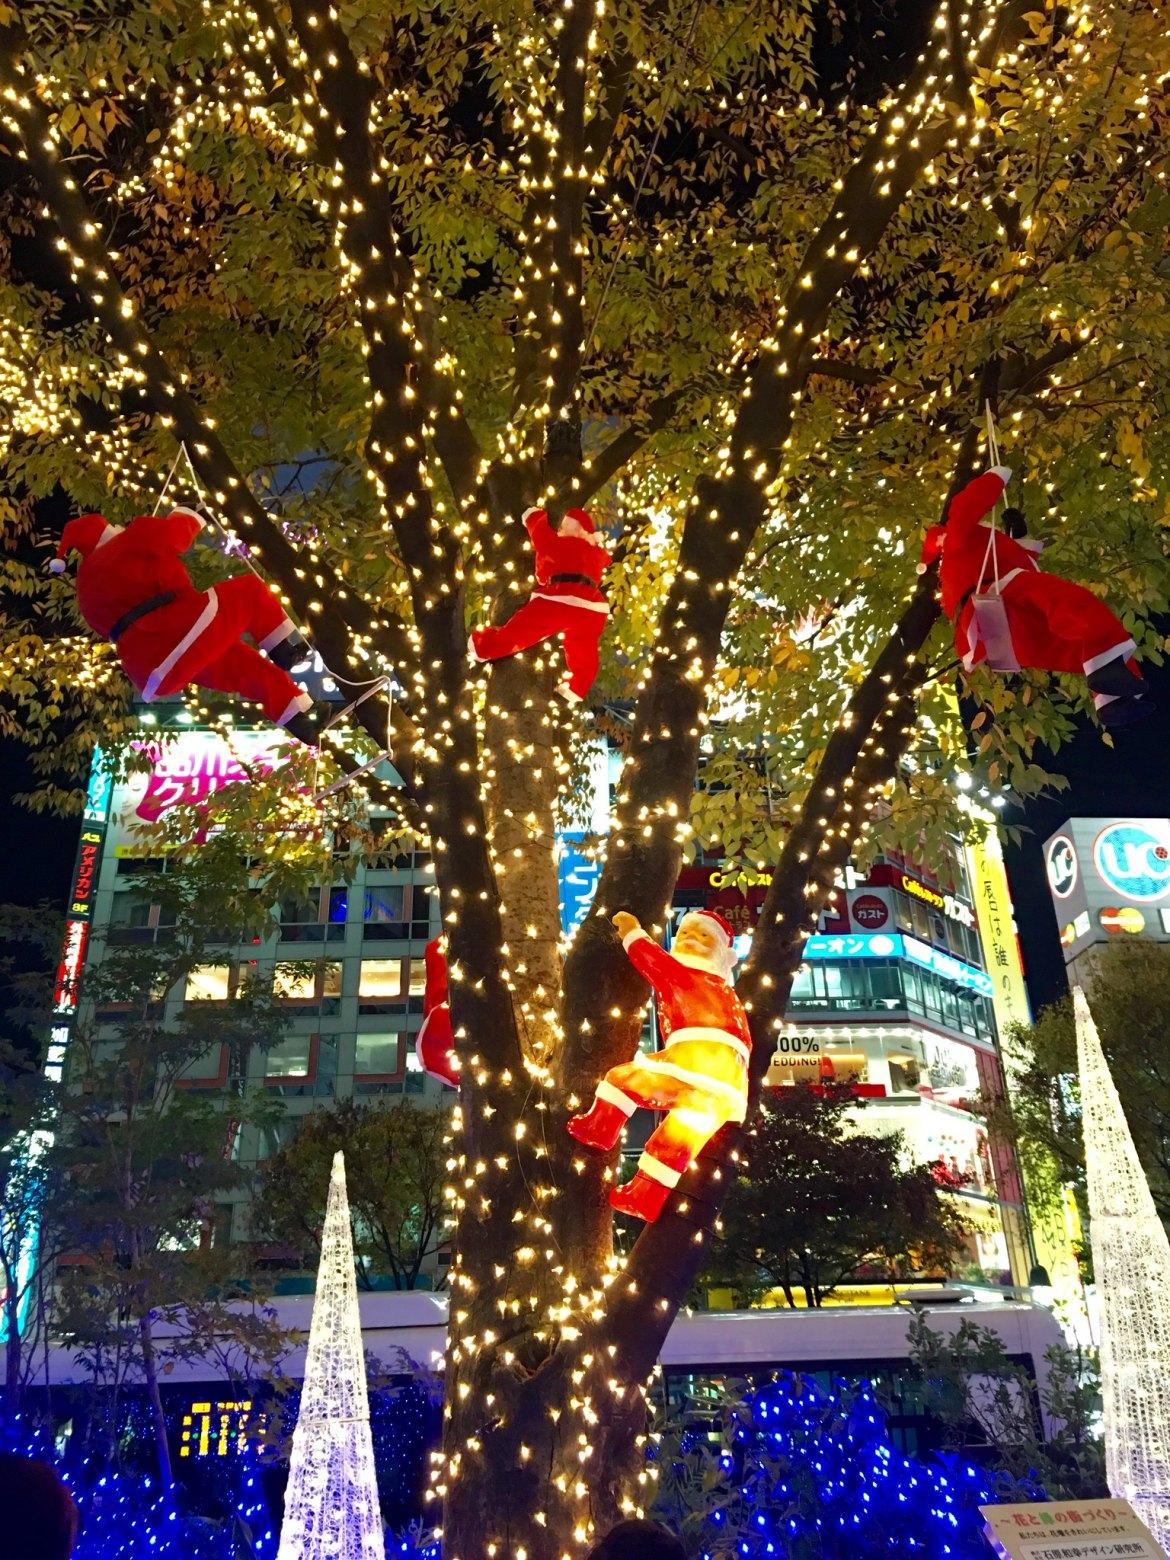 Hachiko and Christmas illumination